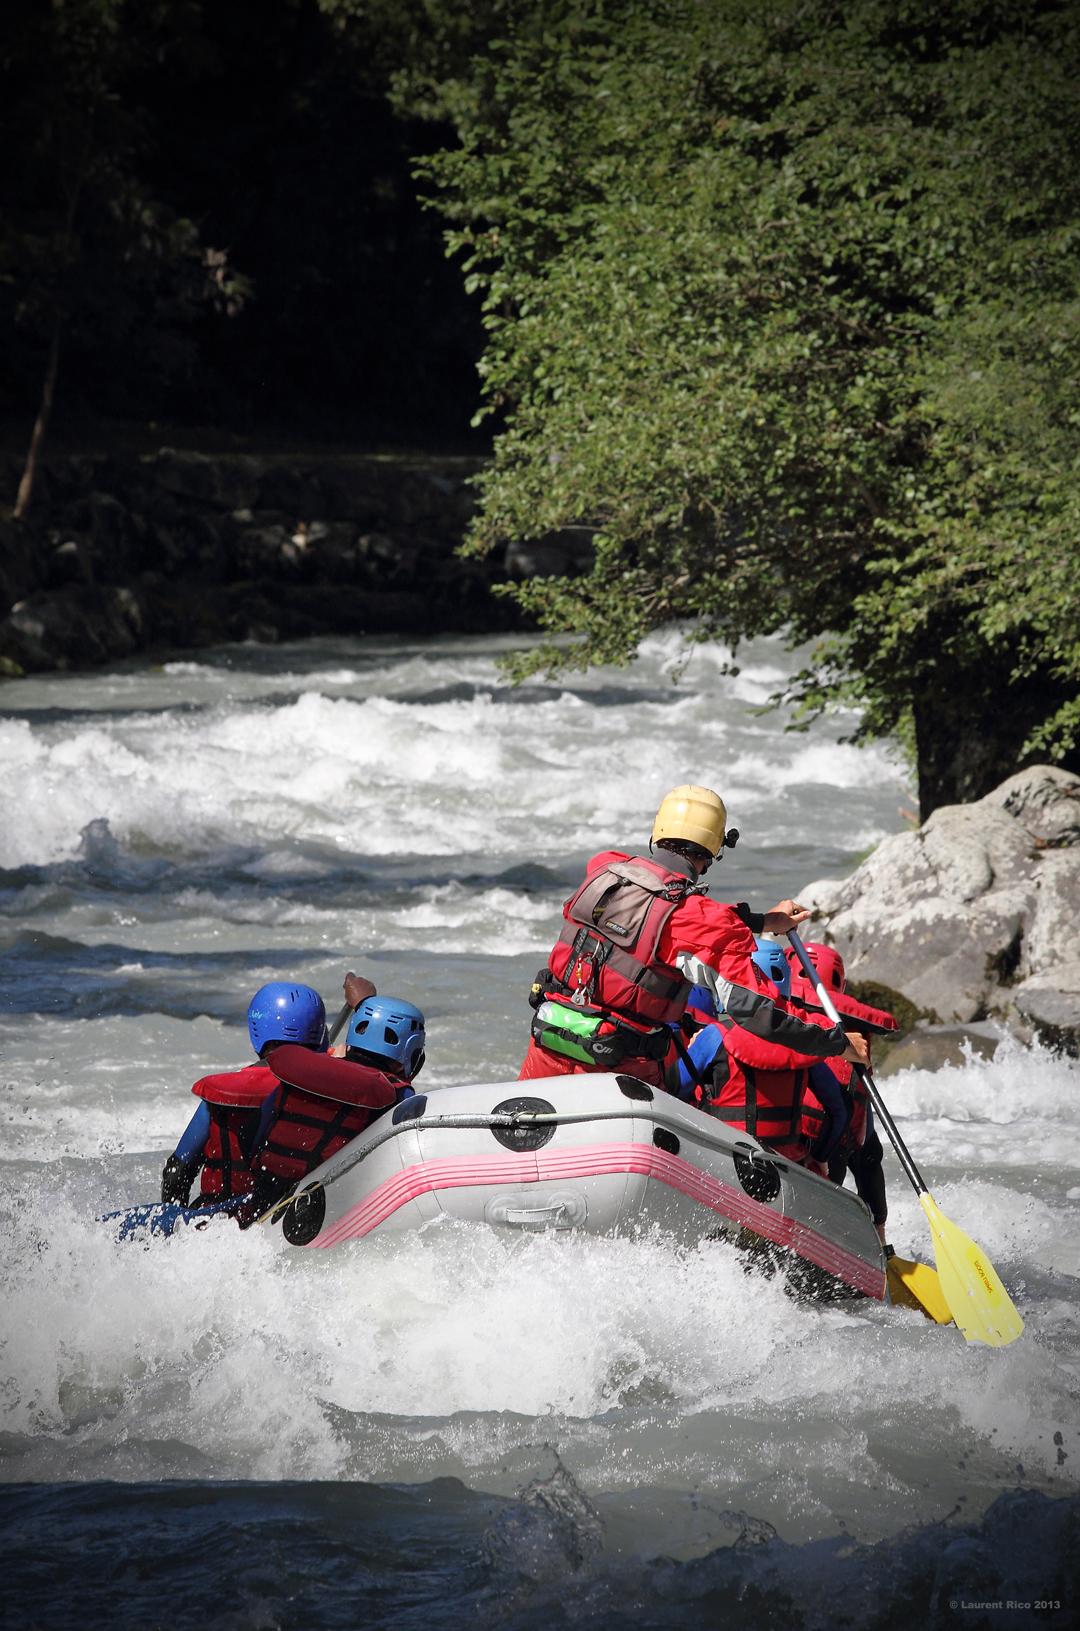 Laurent-rico-savoie-photographies-videos-reportage-outdoor-groupe-riviere-descente-essaonia-rafting-eau-vive-